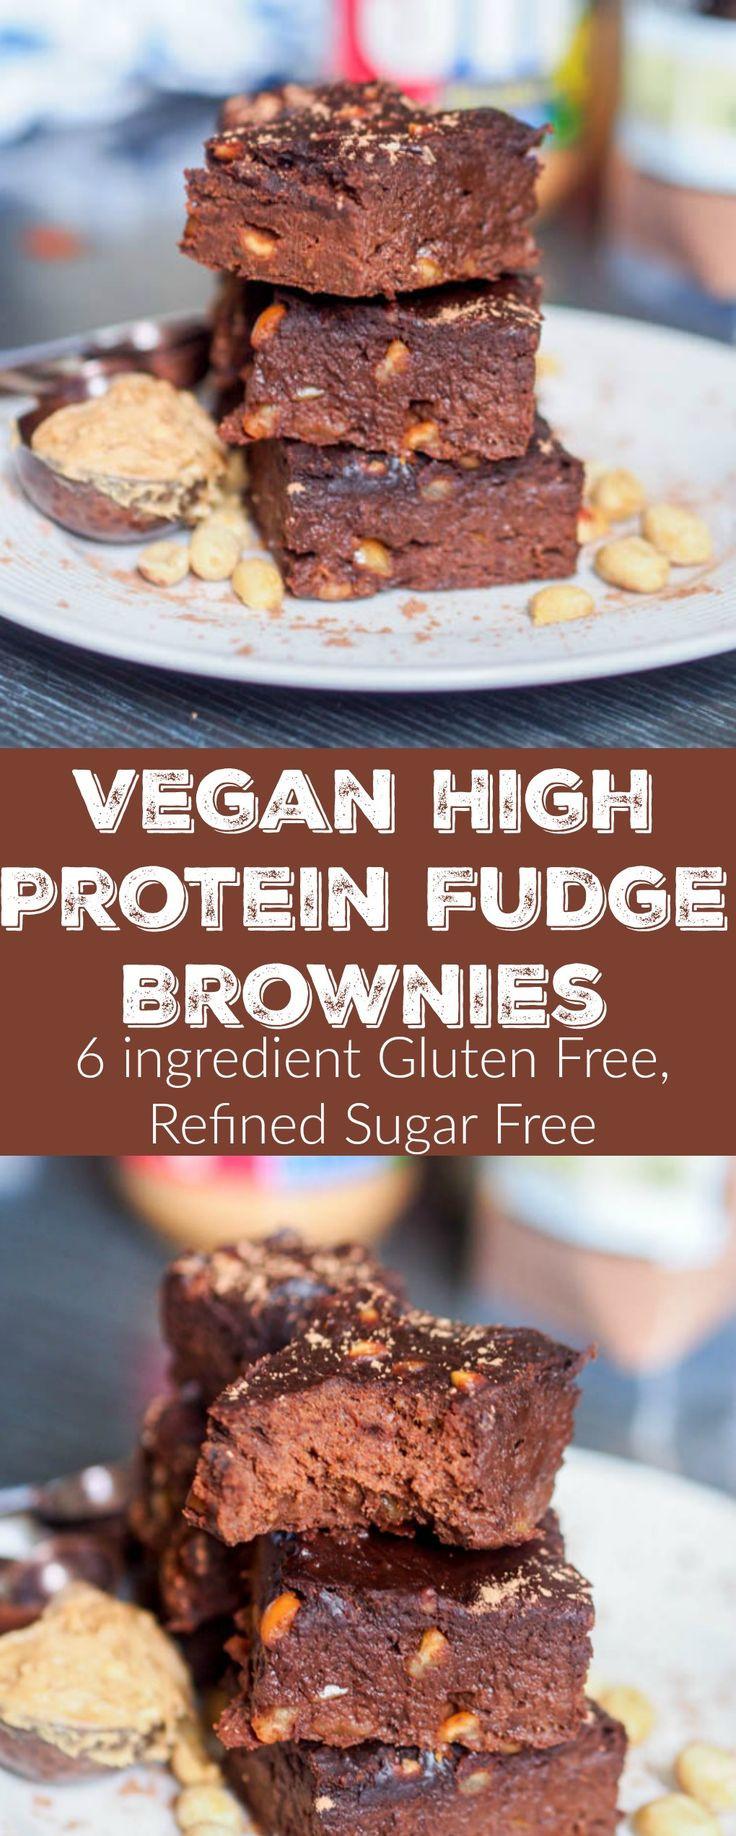 Protein Desserts Recipe  100 High Protein Vegan Recipes on Pinterest